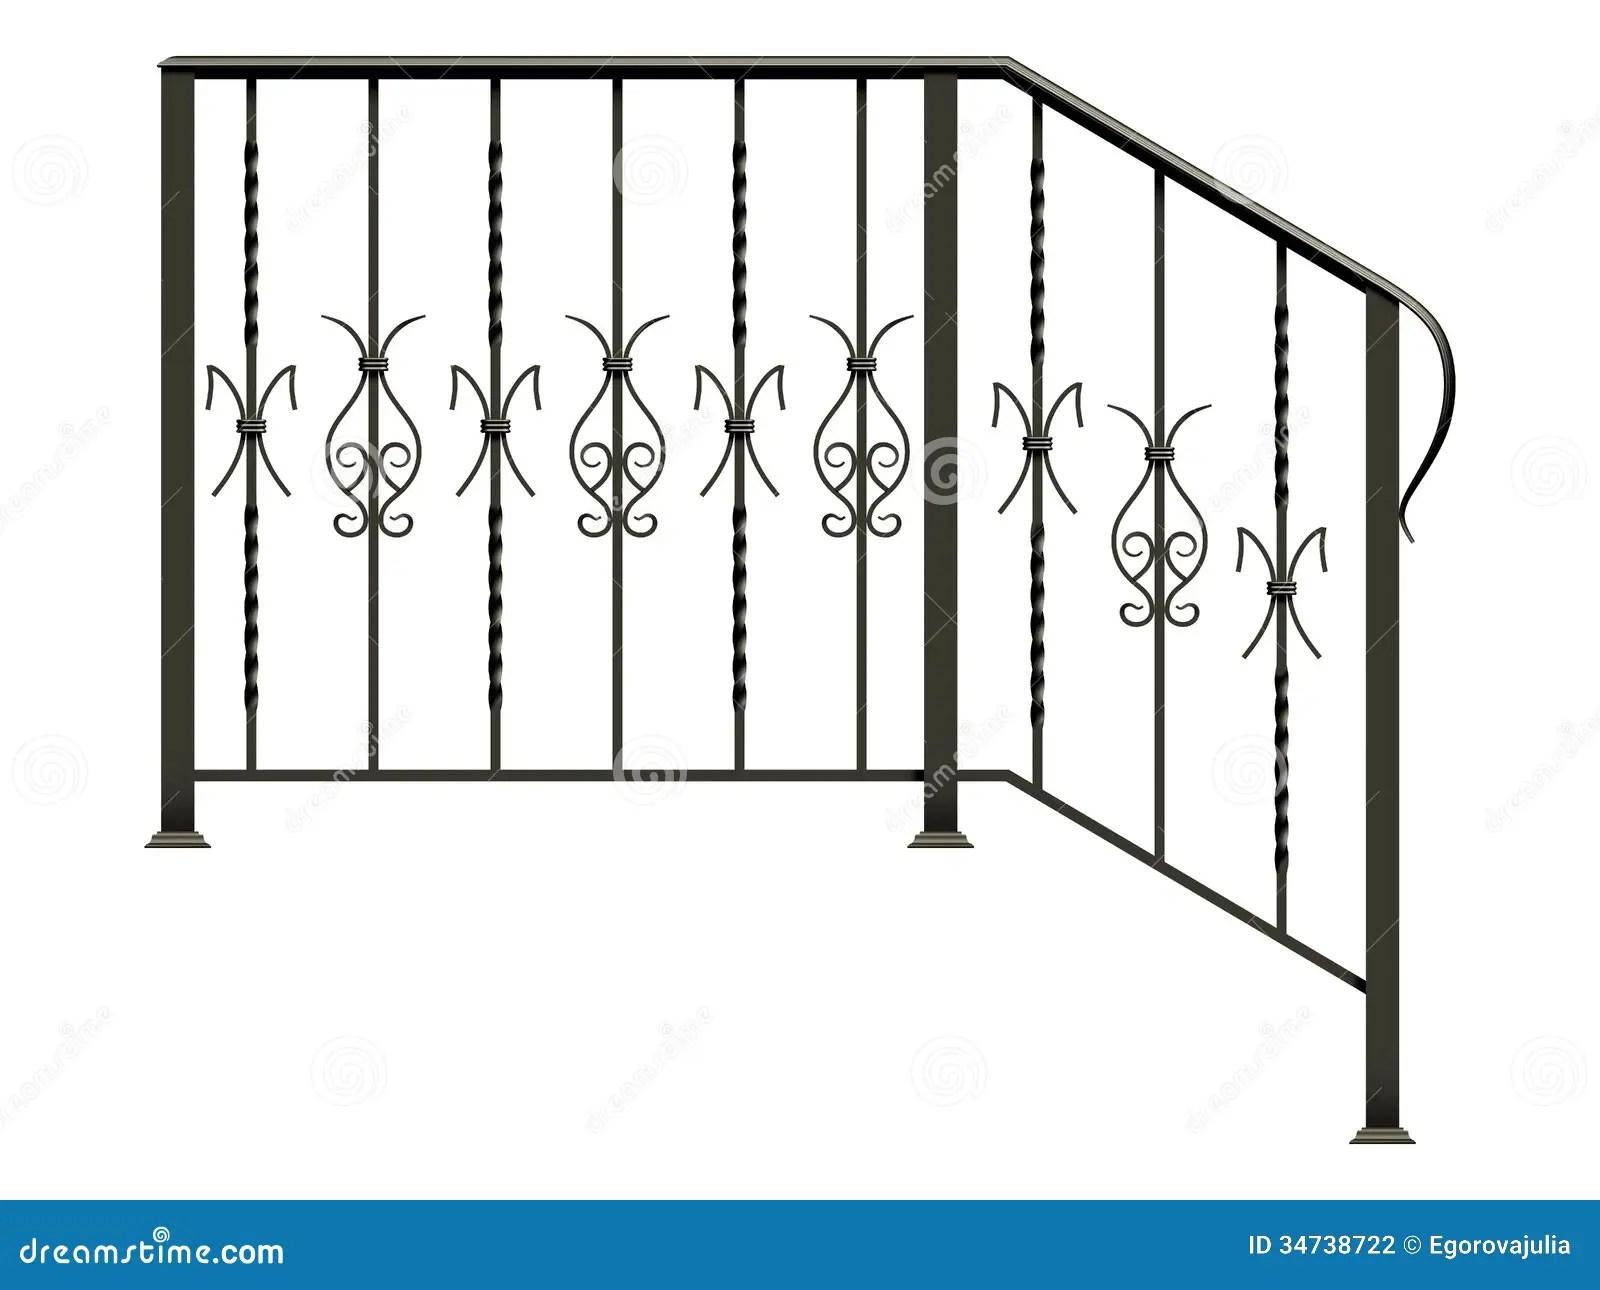 Wrought Iron Stairs Railing Stock Illustration